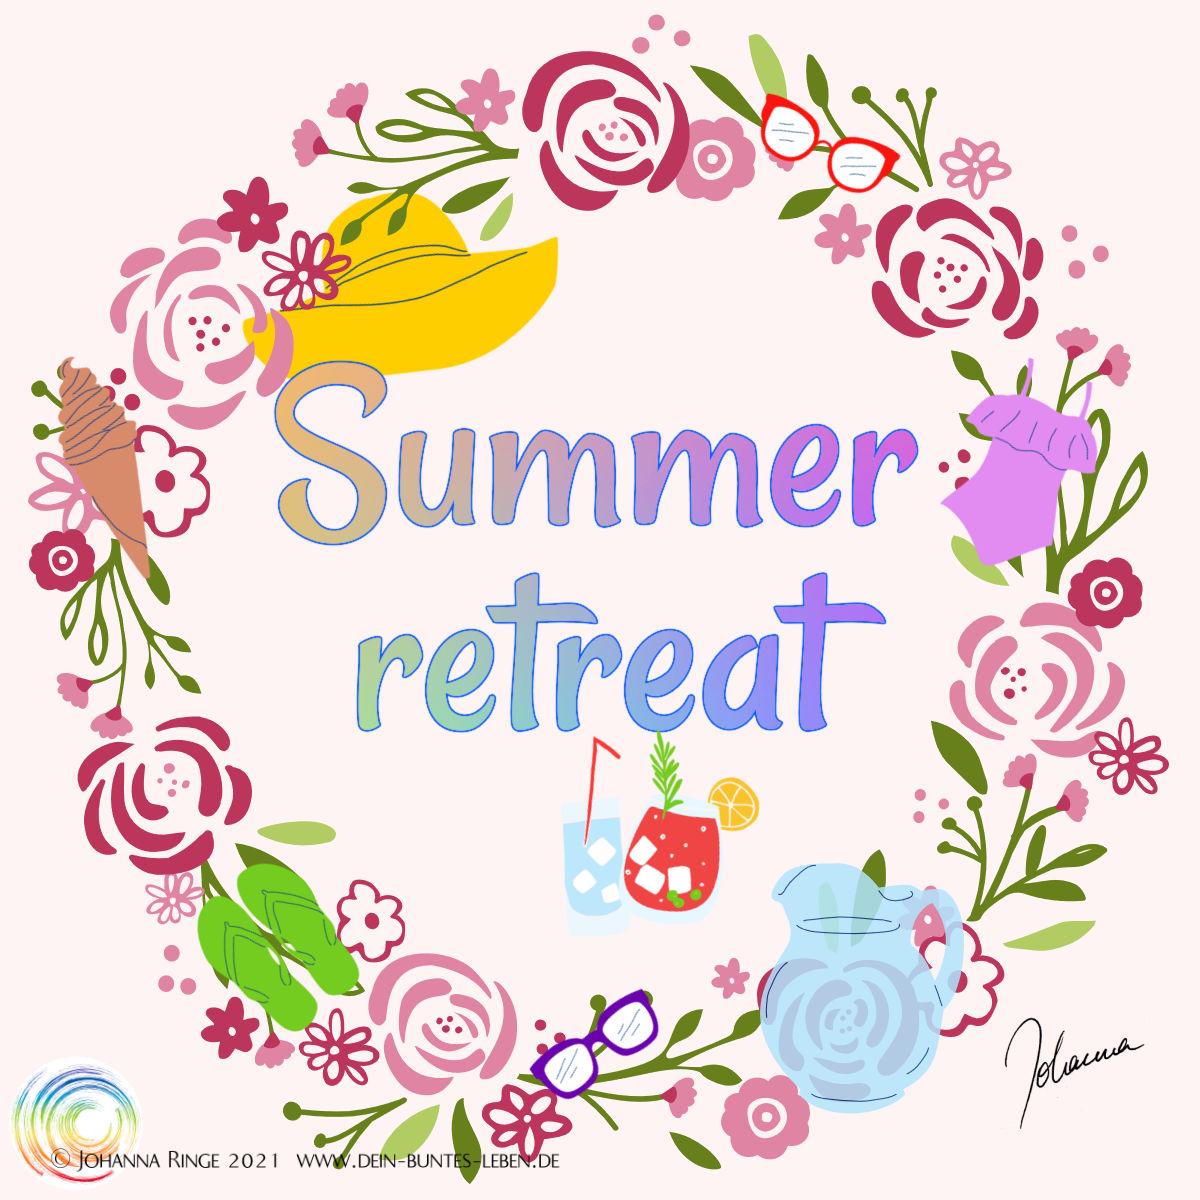 Summer retreat! ©Johanna Ringe 2021 www.johannaringe.com